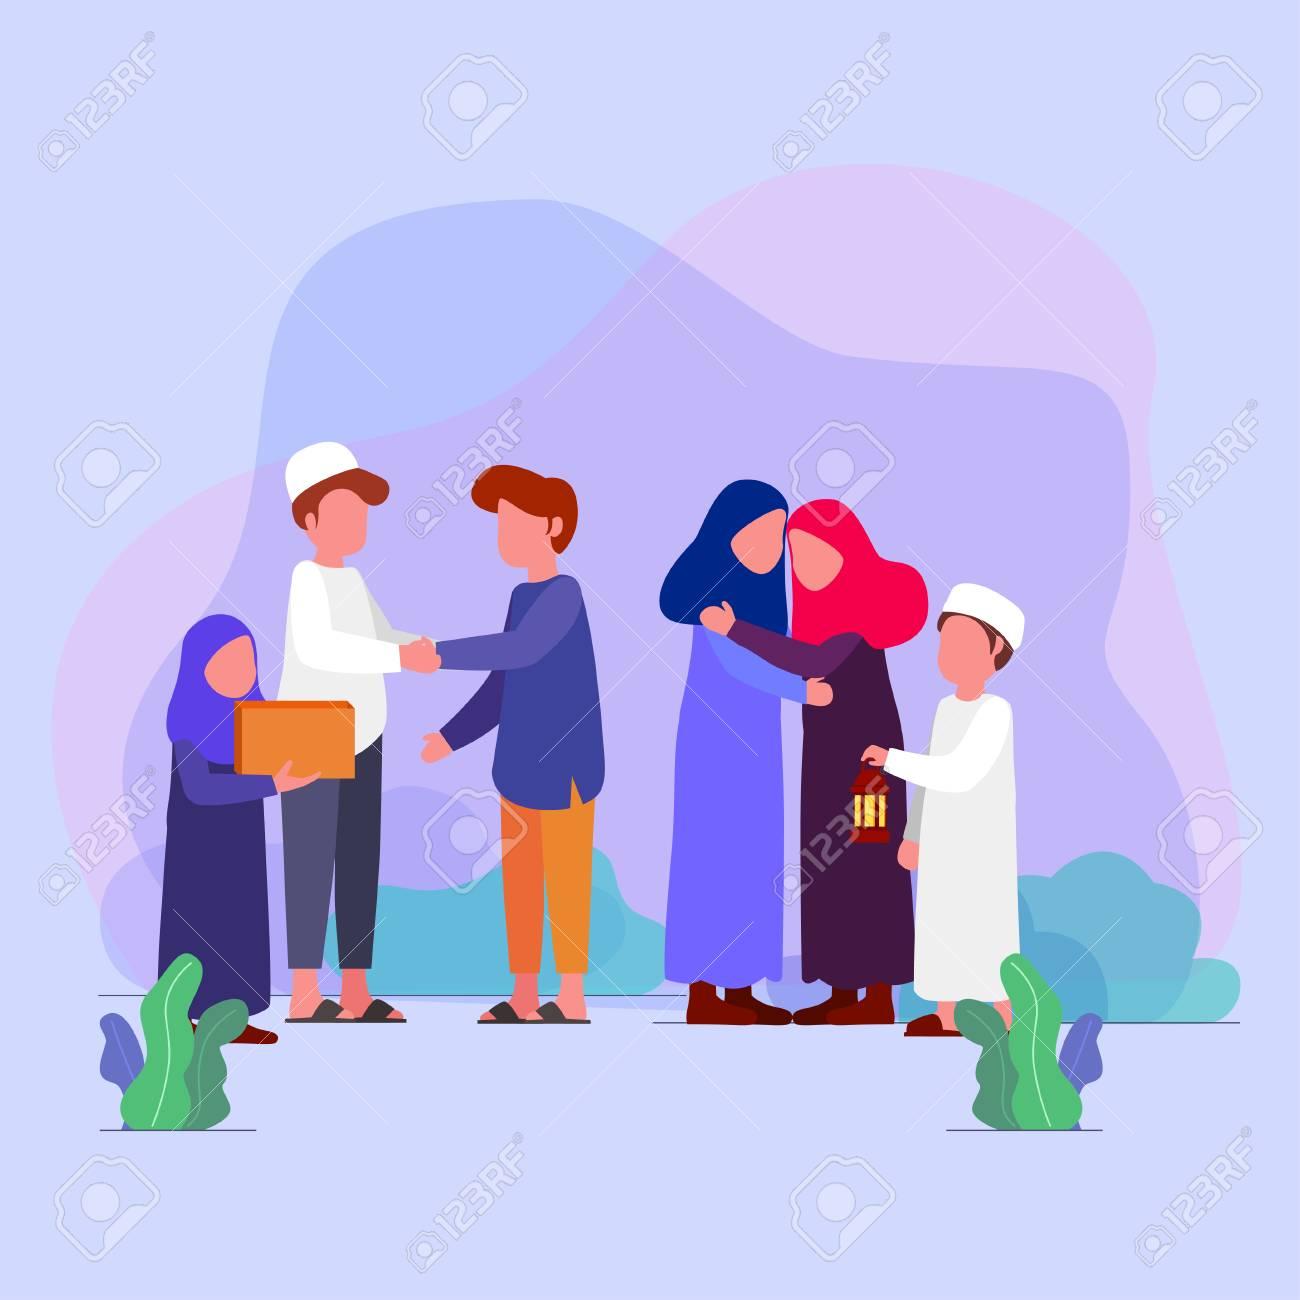 Eid Mubarrak, families visit each other tradition on eid vector illustration greeting card - 115948322